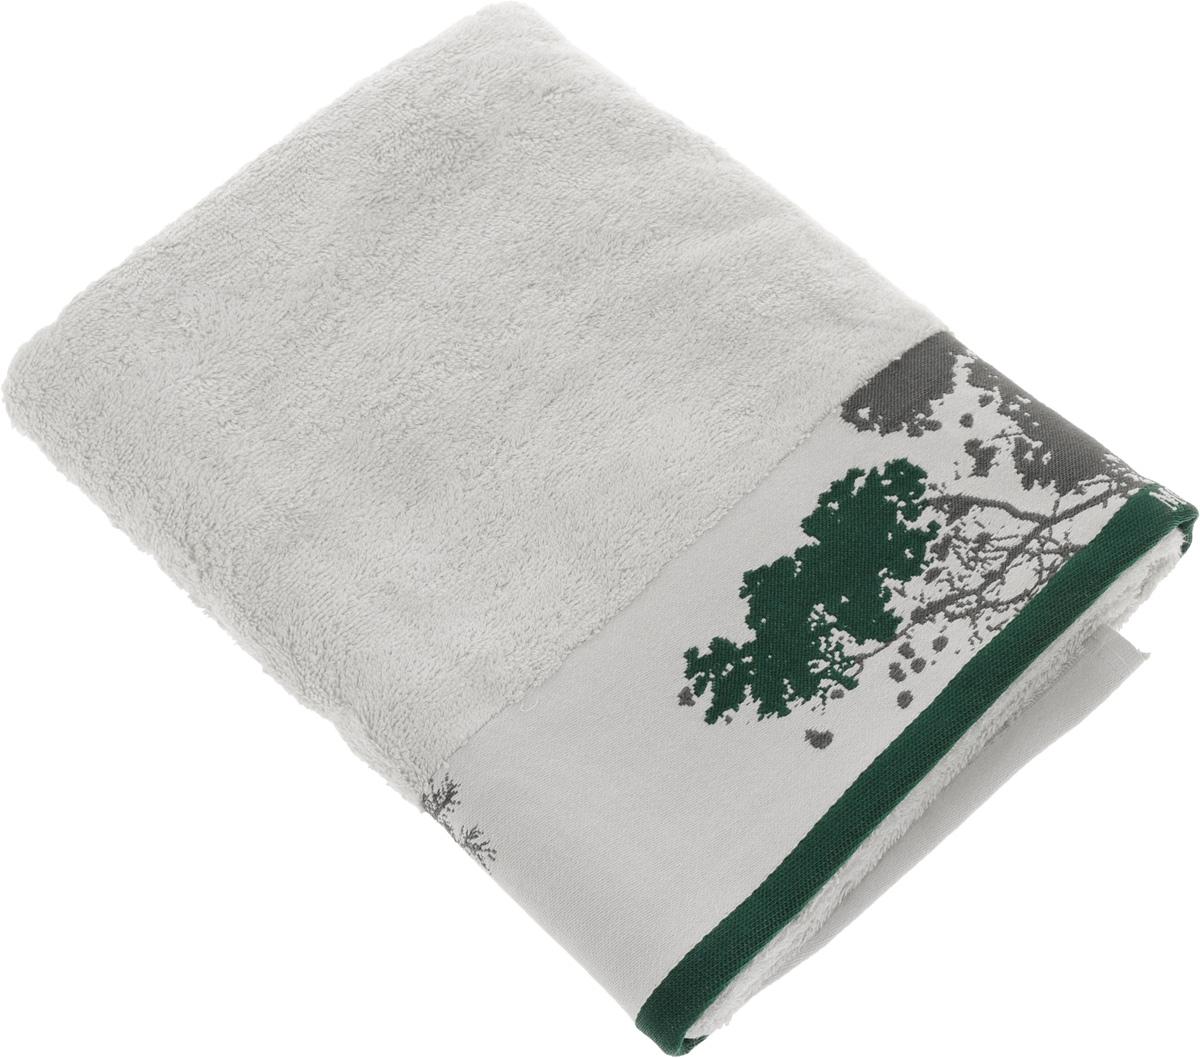 "Полотенце Mona Liza ""Nature"", цвет: светло-серый, зеленый, 70 х 140 см 529674/2"